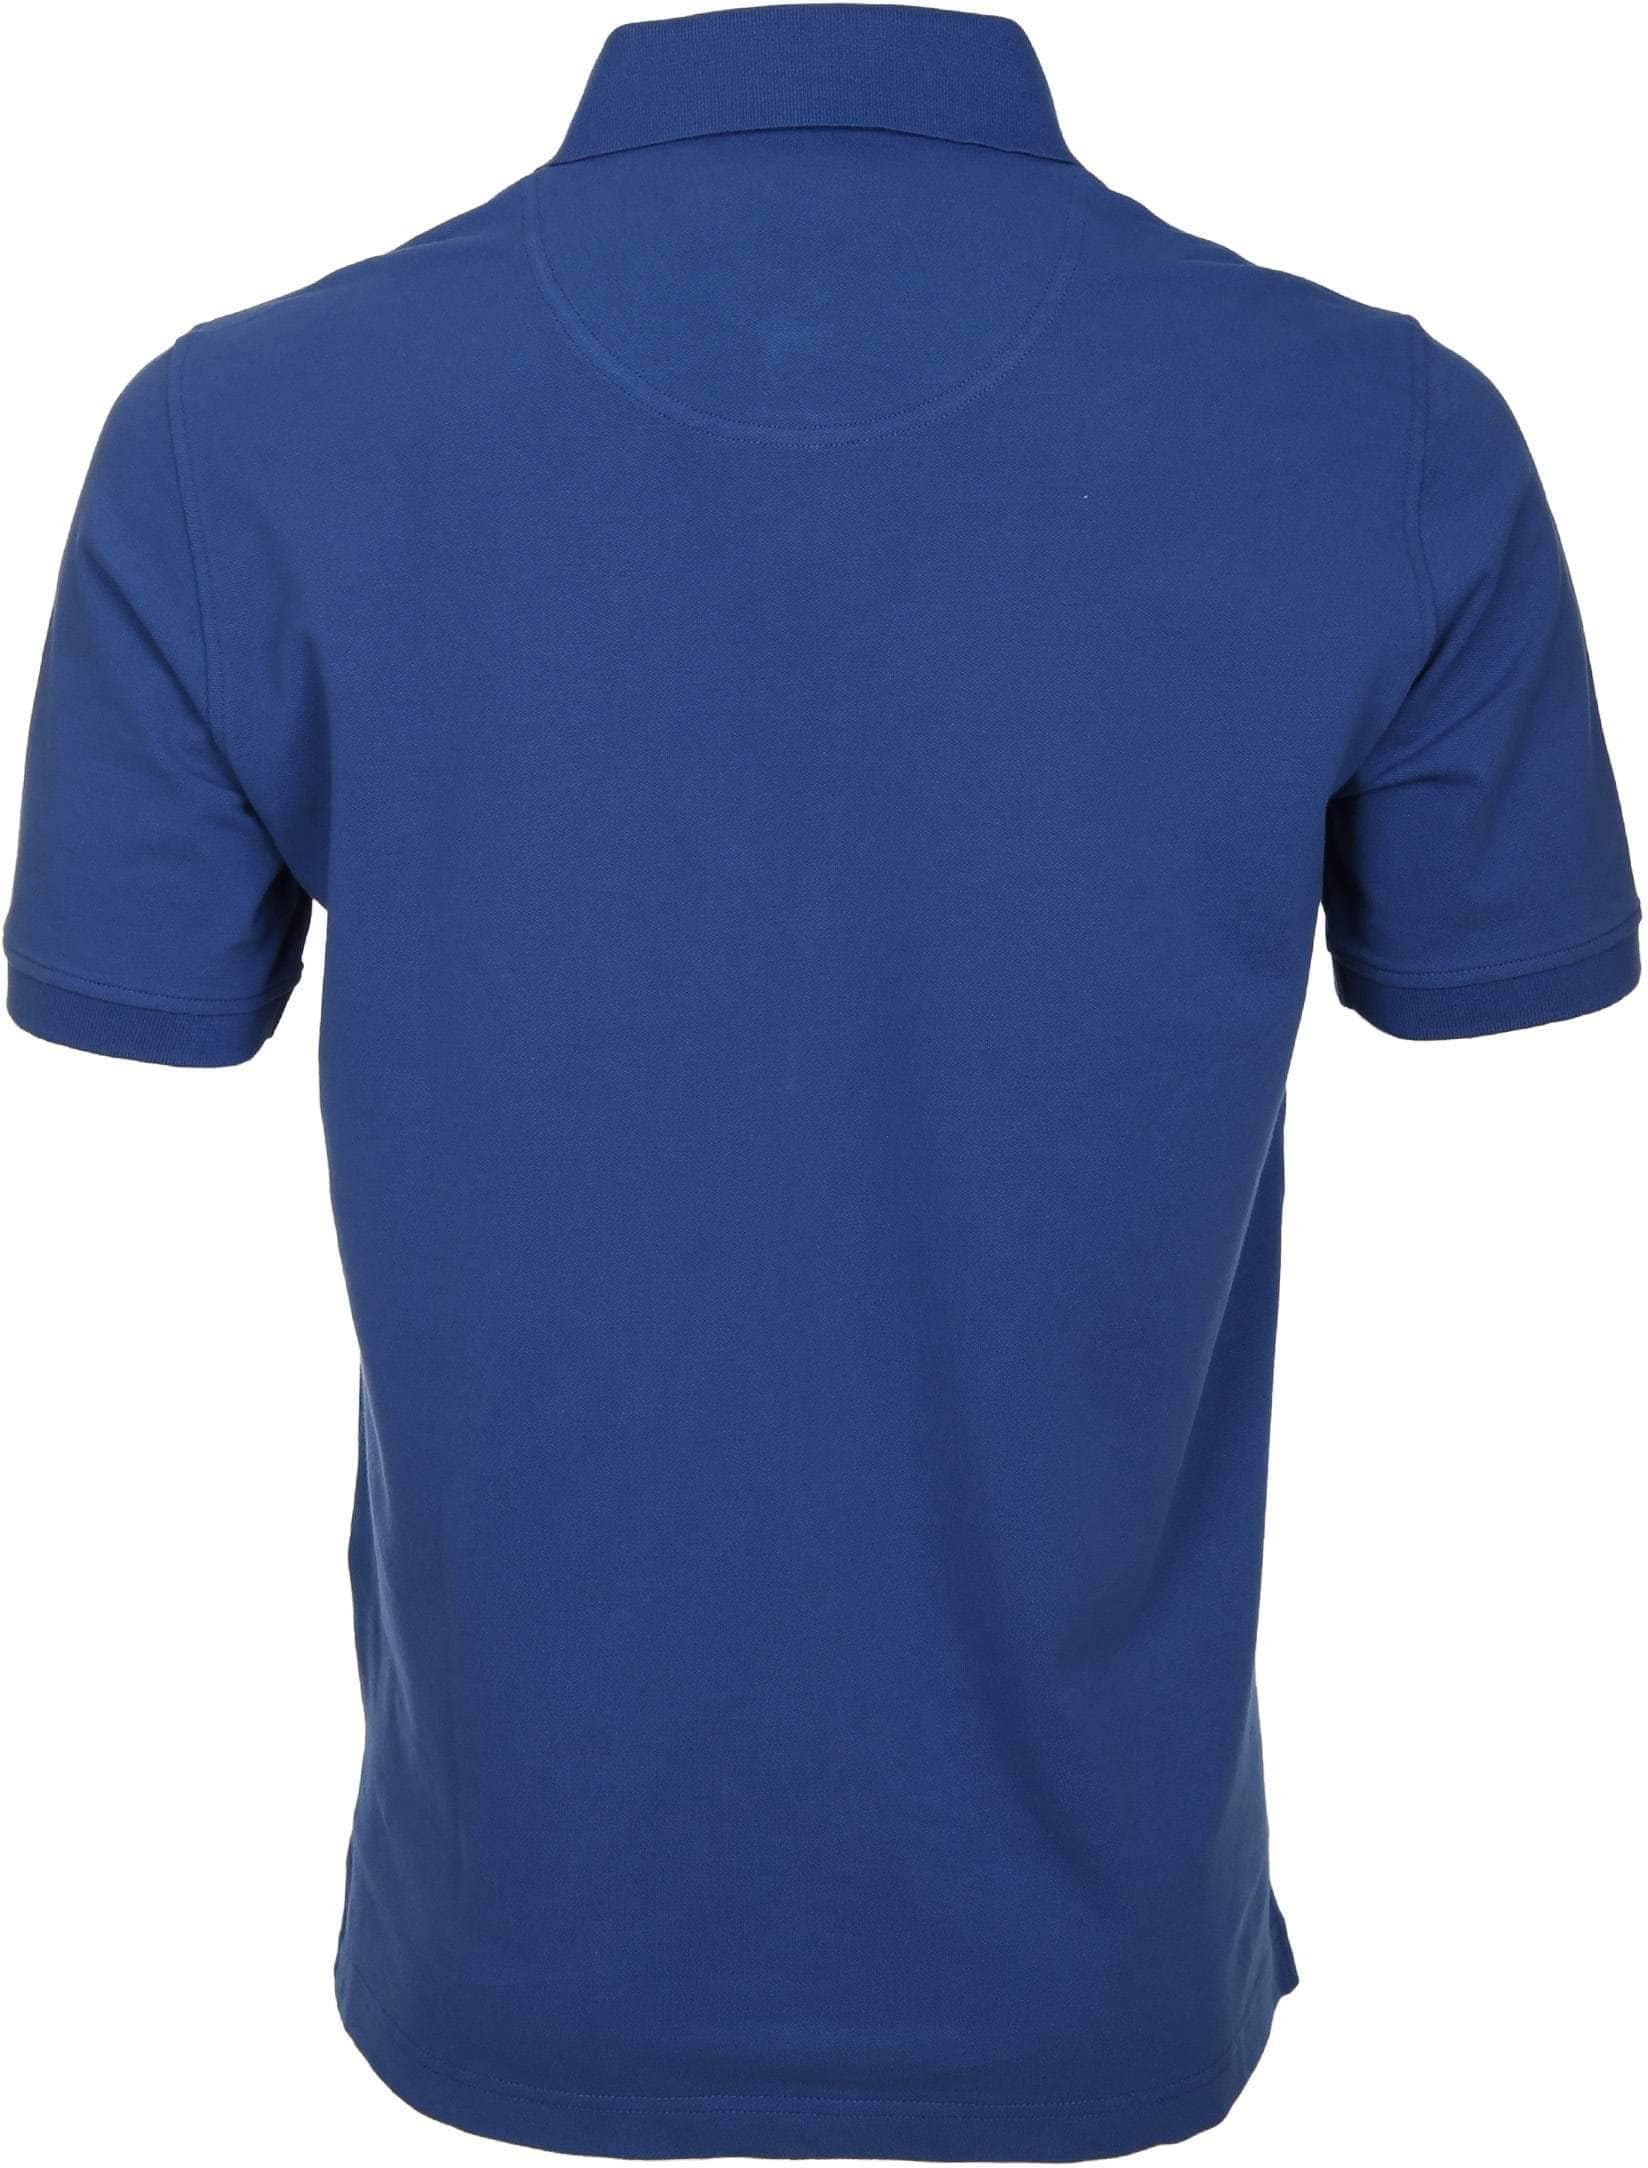 Suitable Poloshirt Basic Royal Blue foto 4